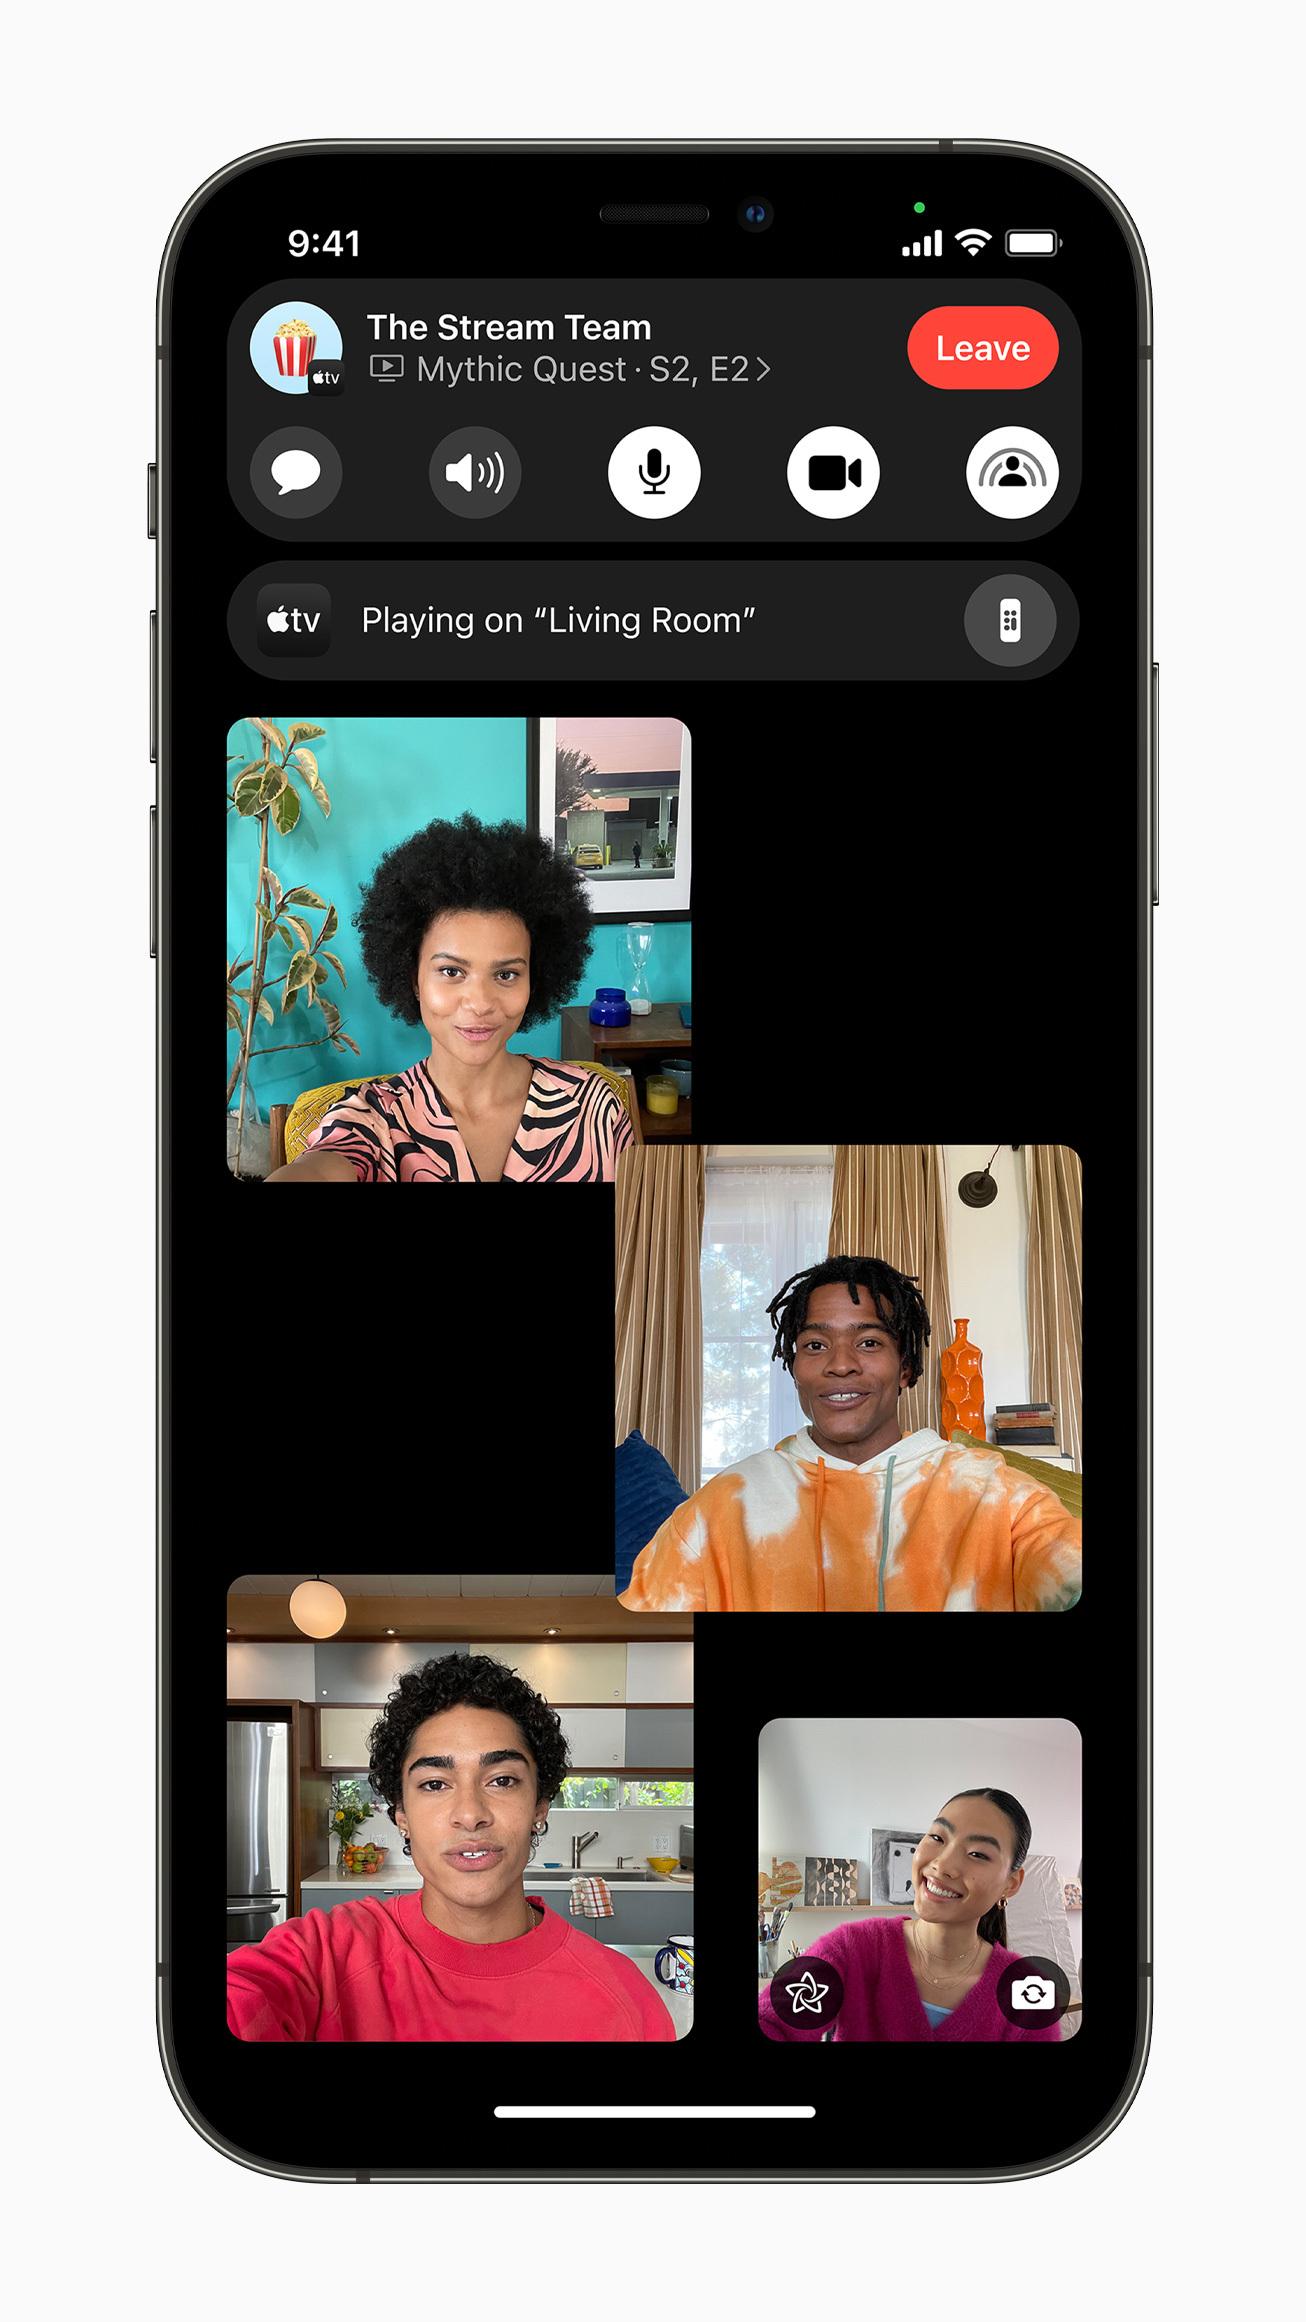 Apple-iPhone12Pro-iOS15-FaceTime-expanse-groupfacetime-060721.jpg